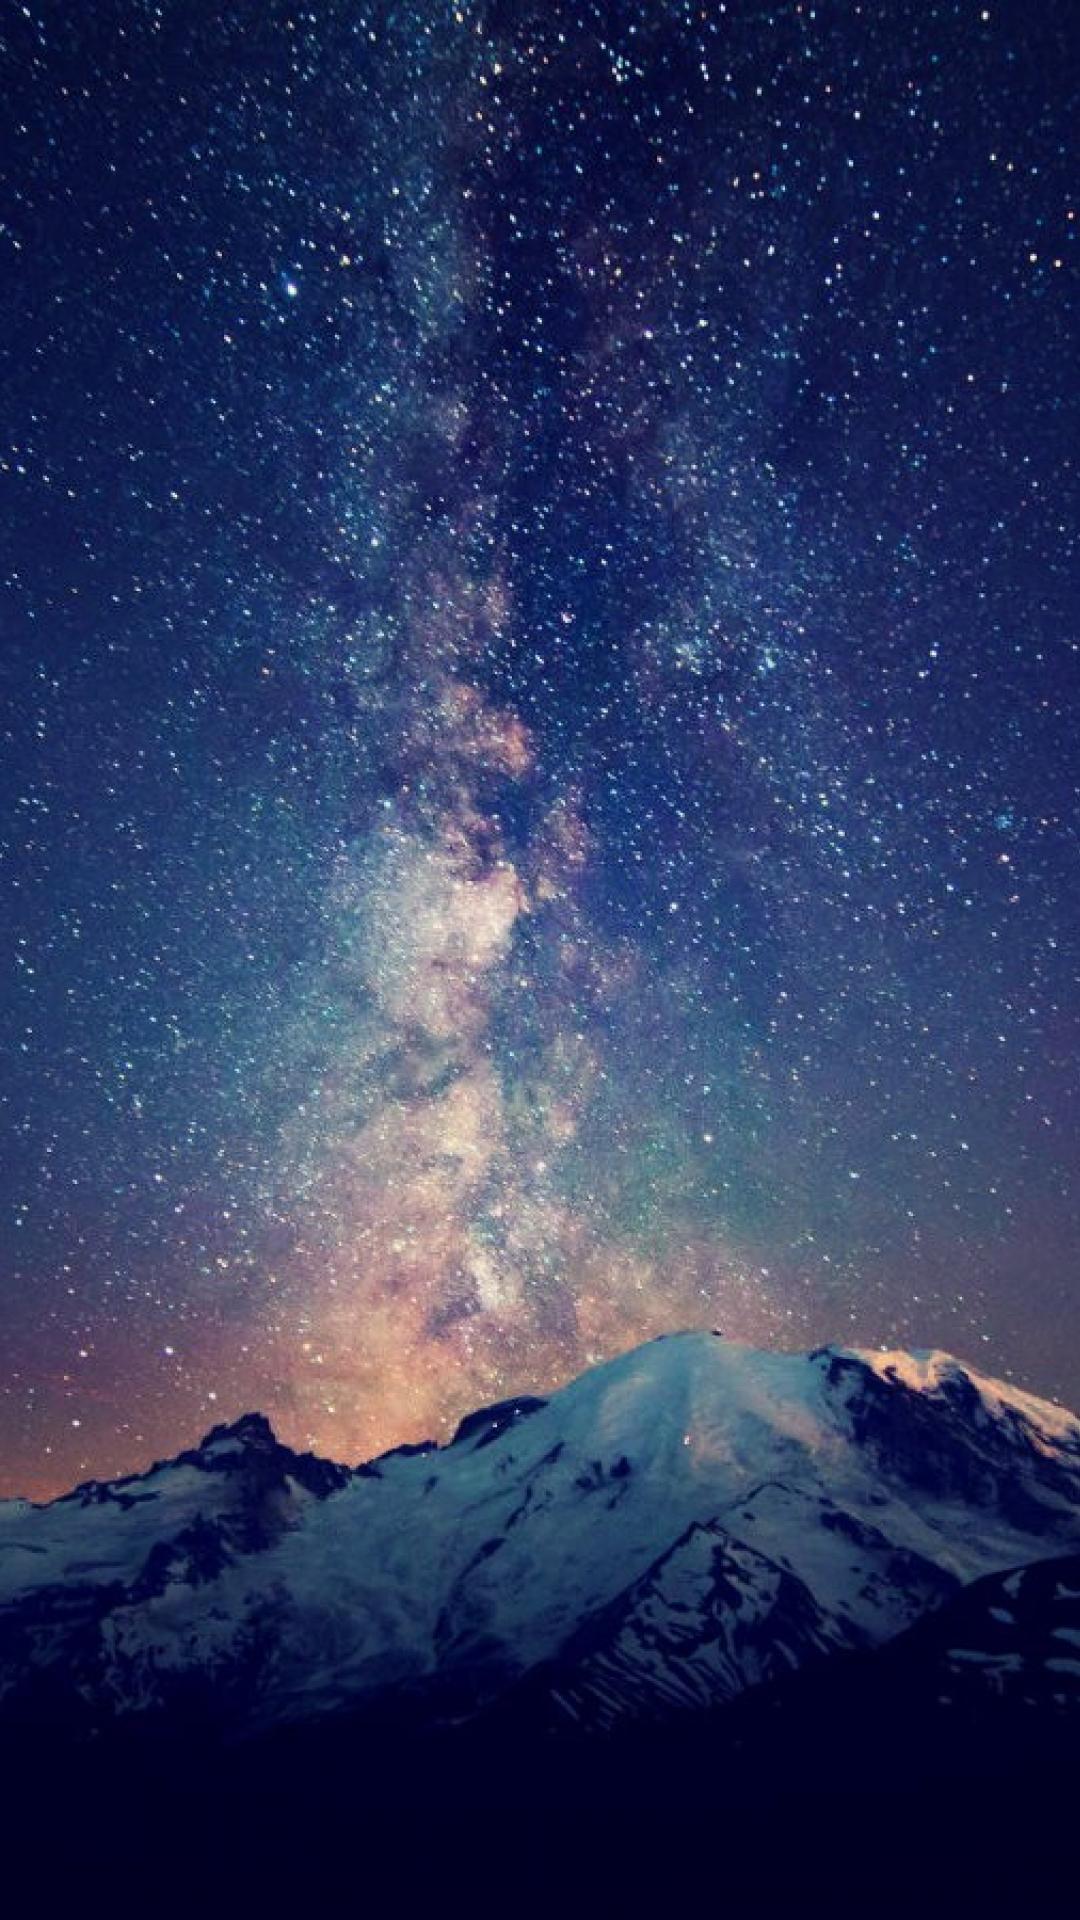 [39+] Milky Way Galaxy Wallpaper HD on WallpaperSafari